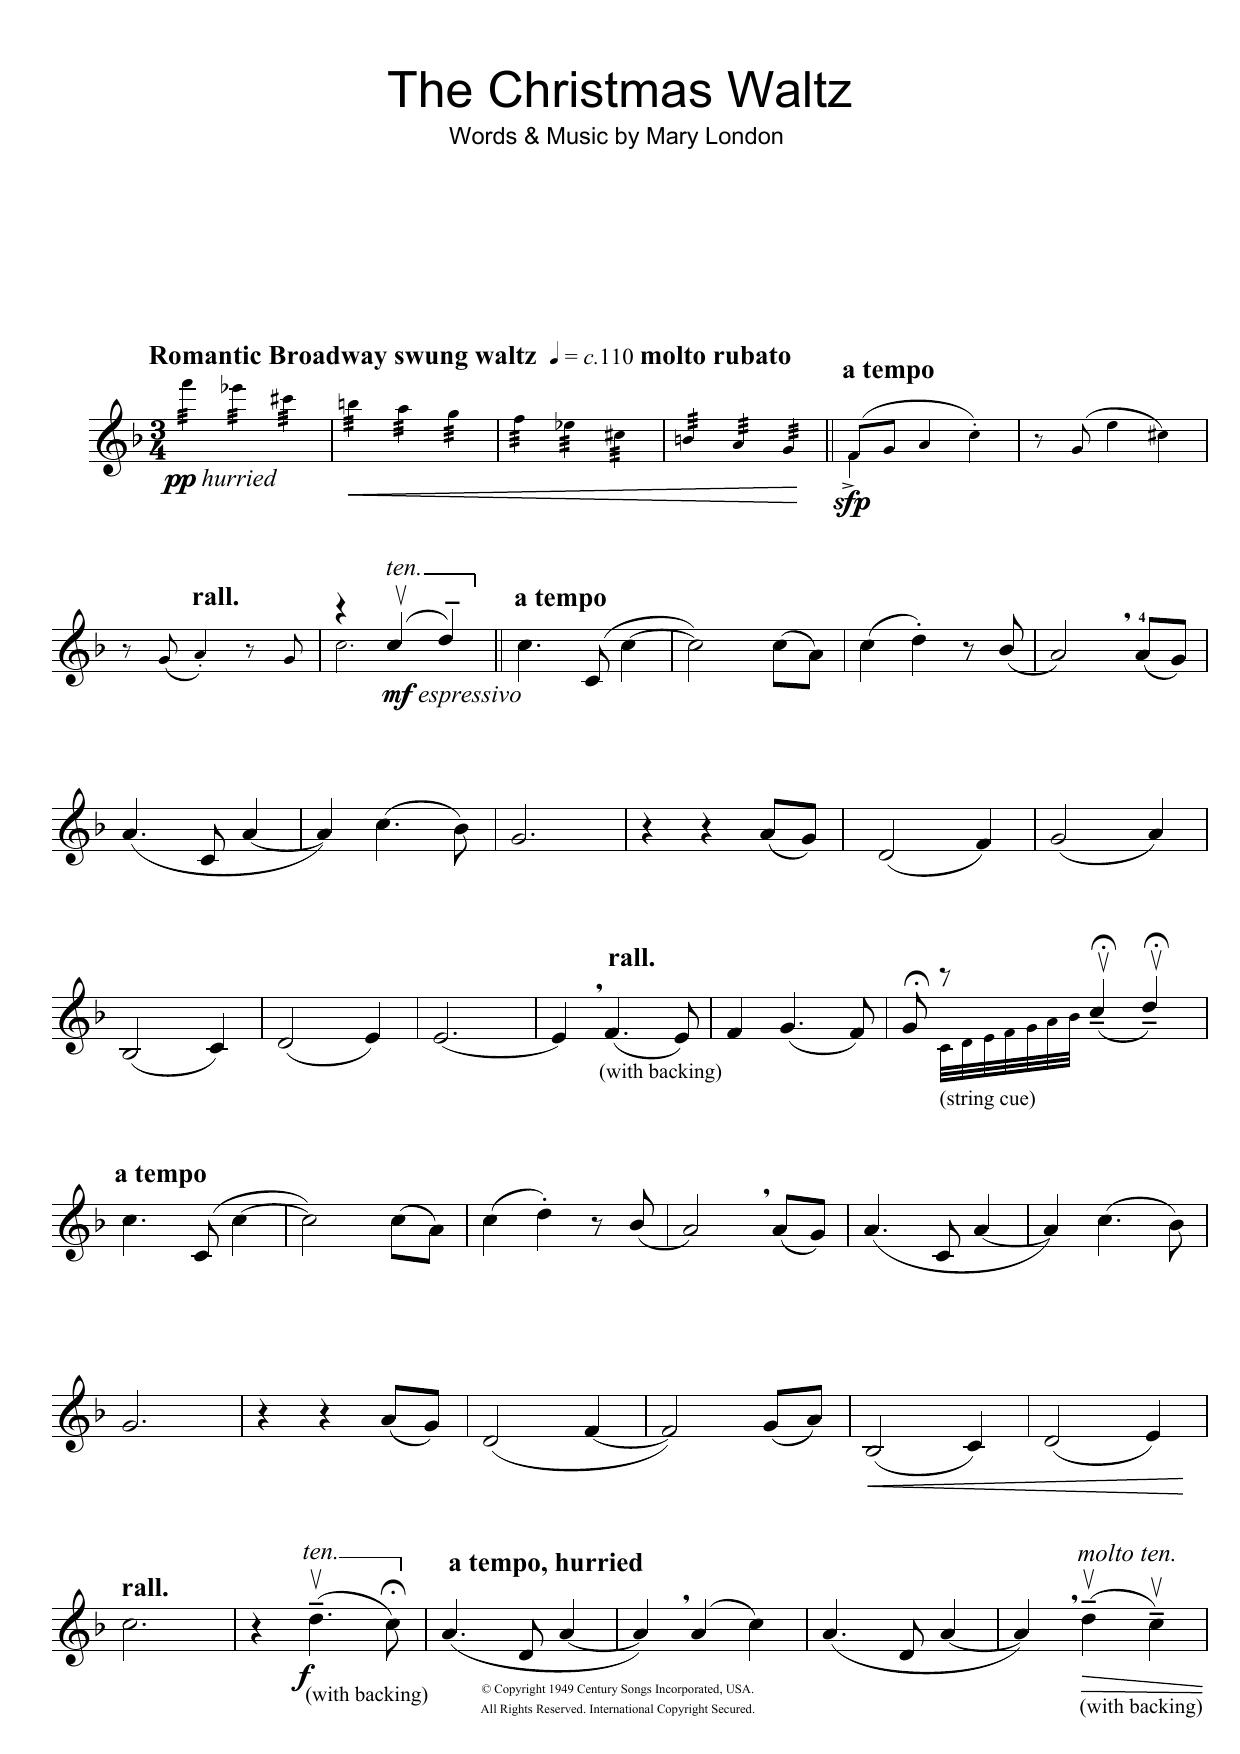 Mary London - The Christmas Waltz